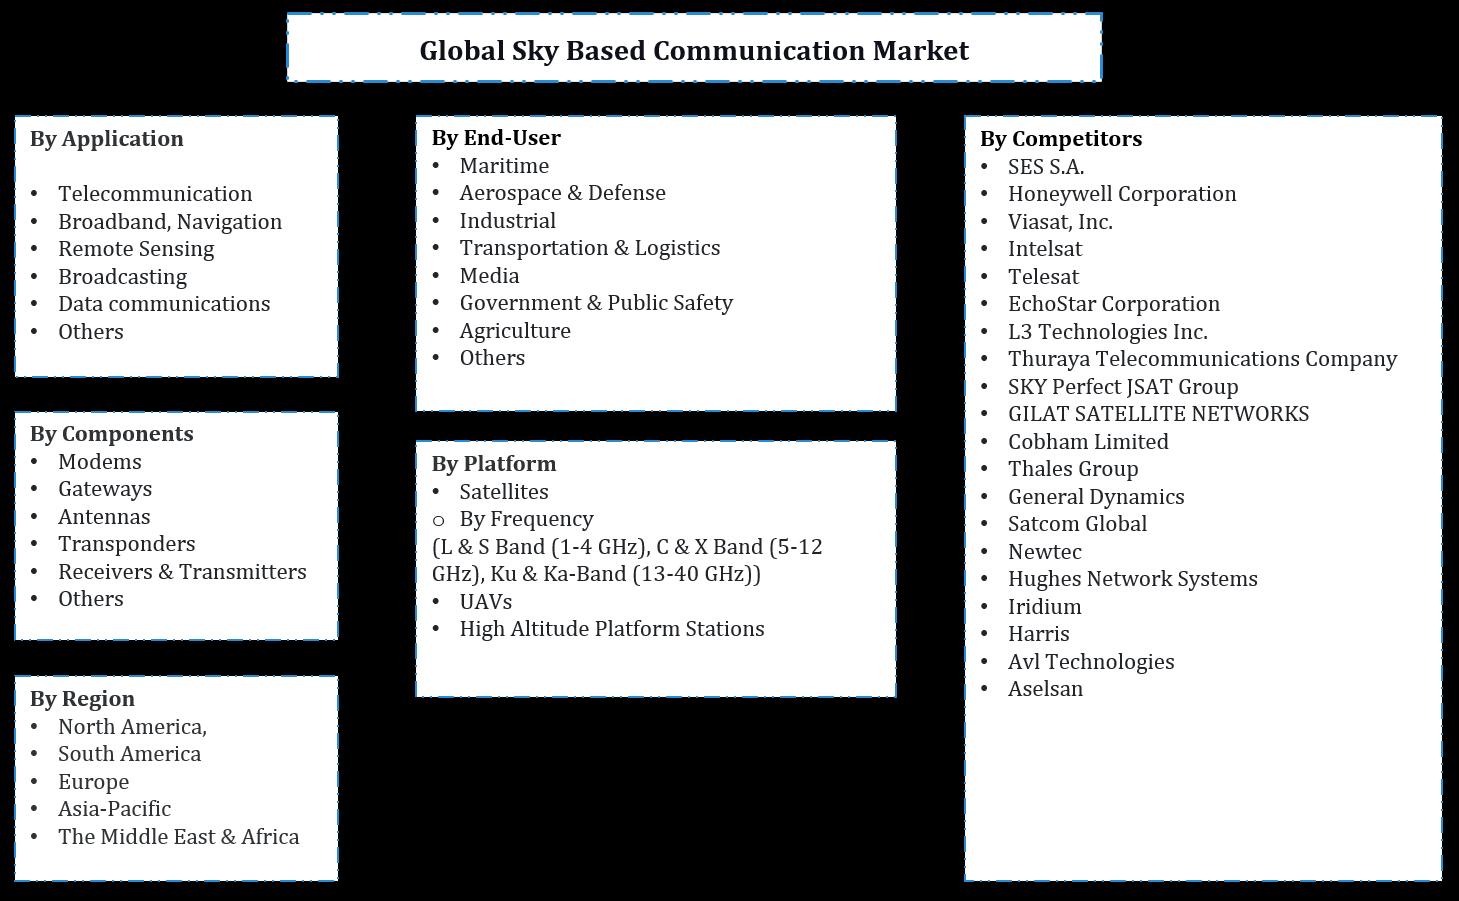 Global Sky Based Communication Market Segmentation